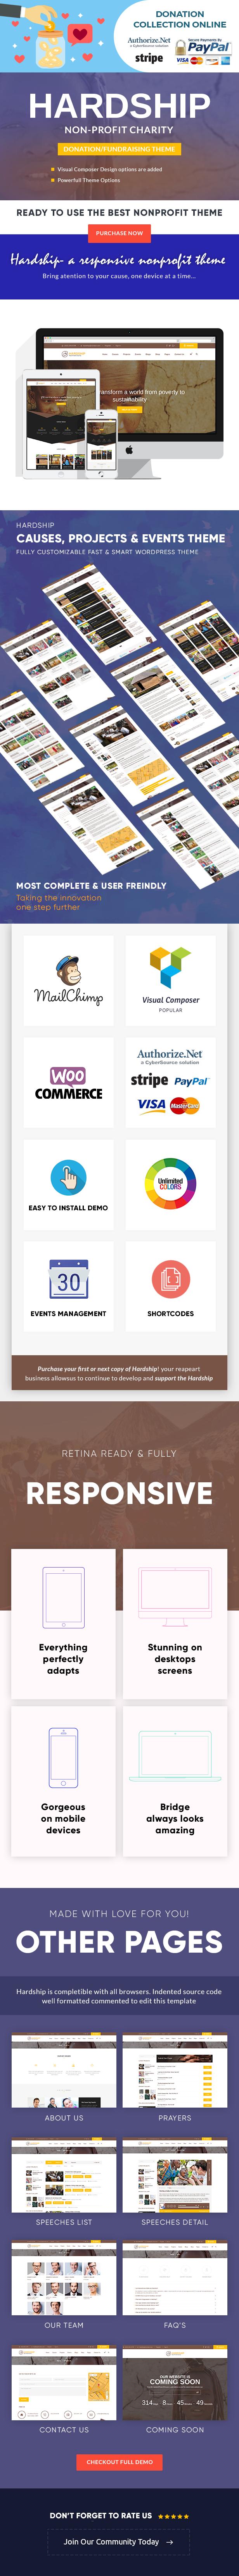 Hardship Charity Donation | Nonprofit / Fundraising WordPress Theme